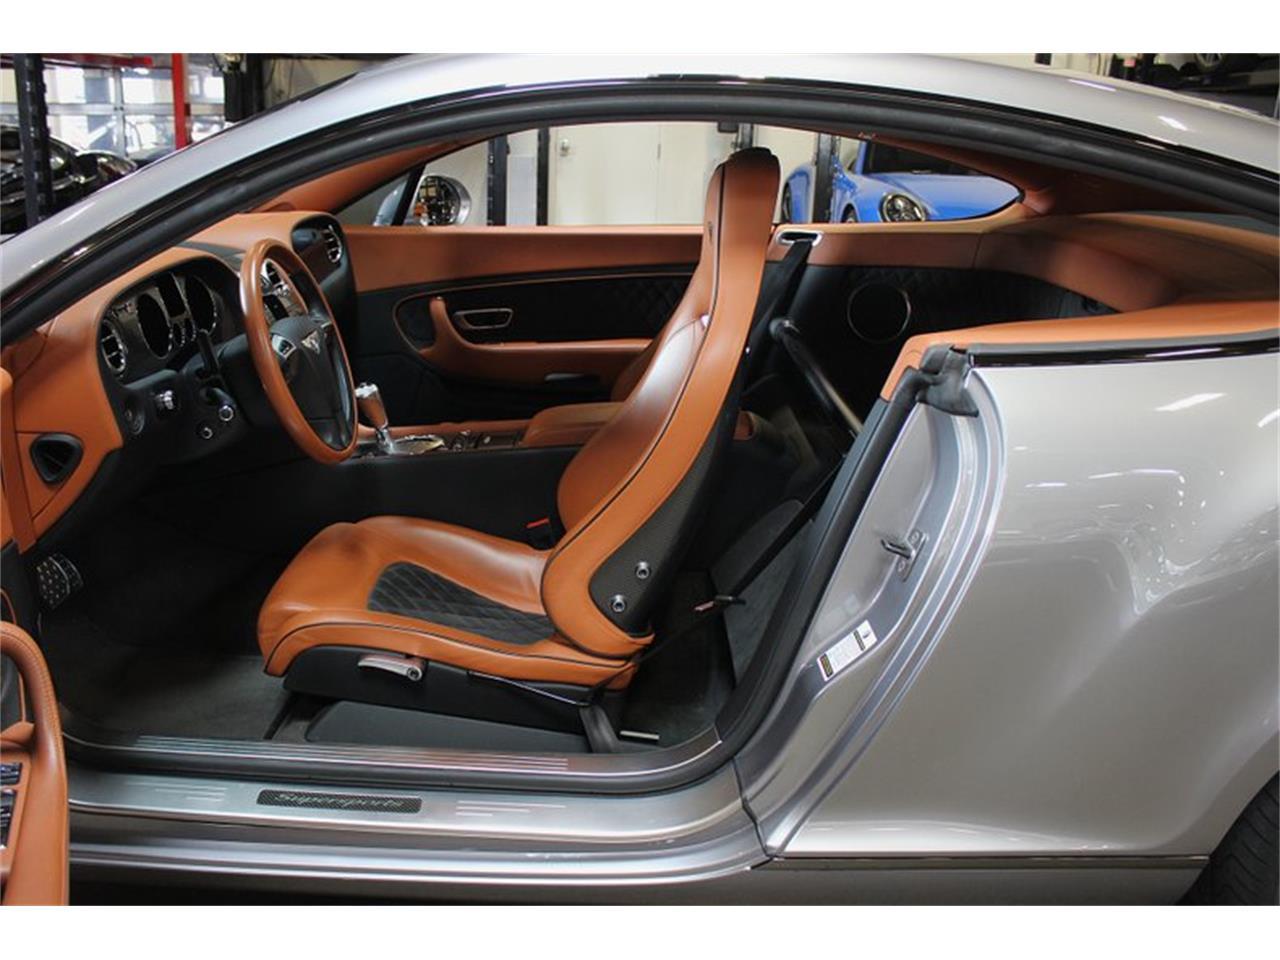 2010 Bentley Continental (CC-1207927) for sale in San Carlos, California